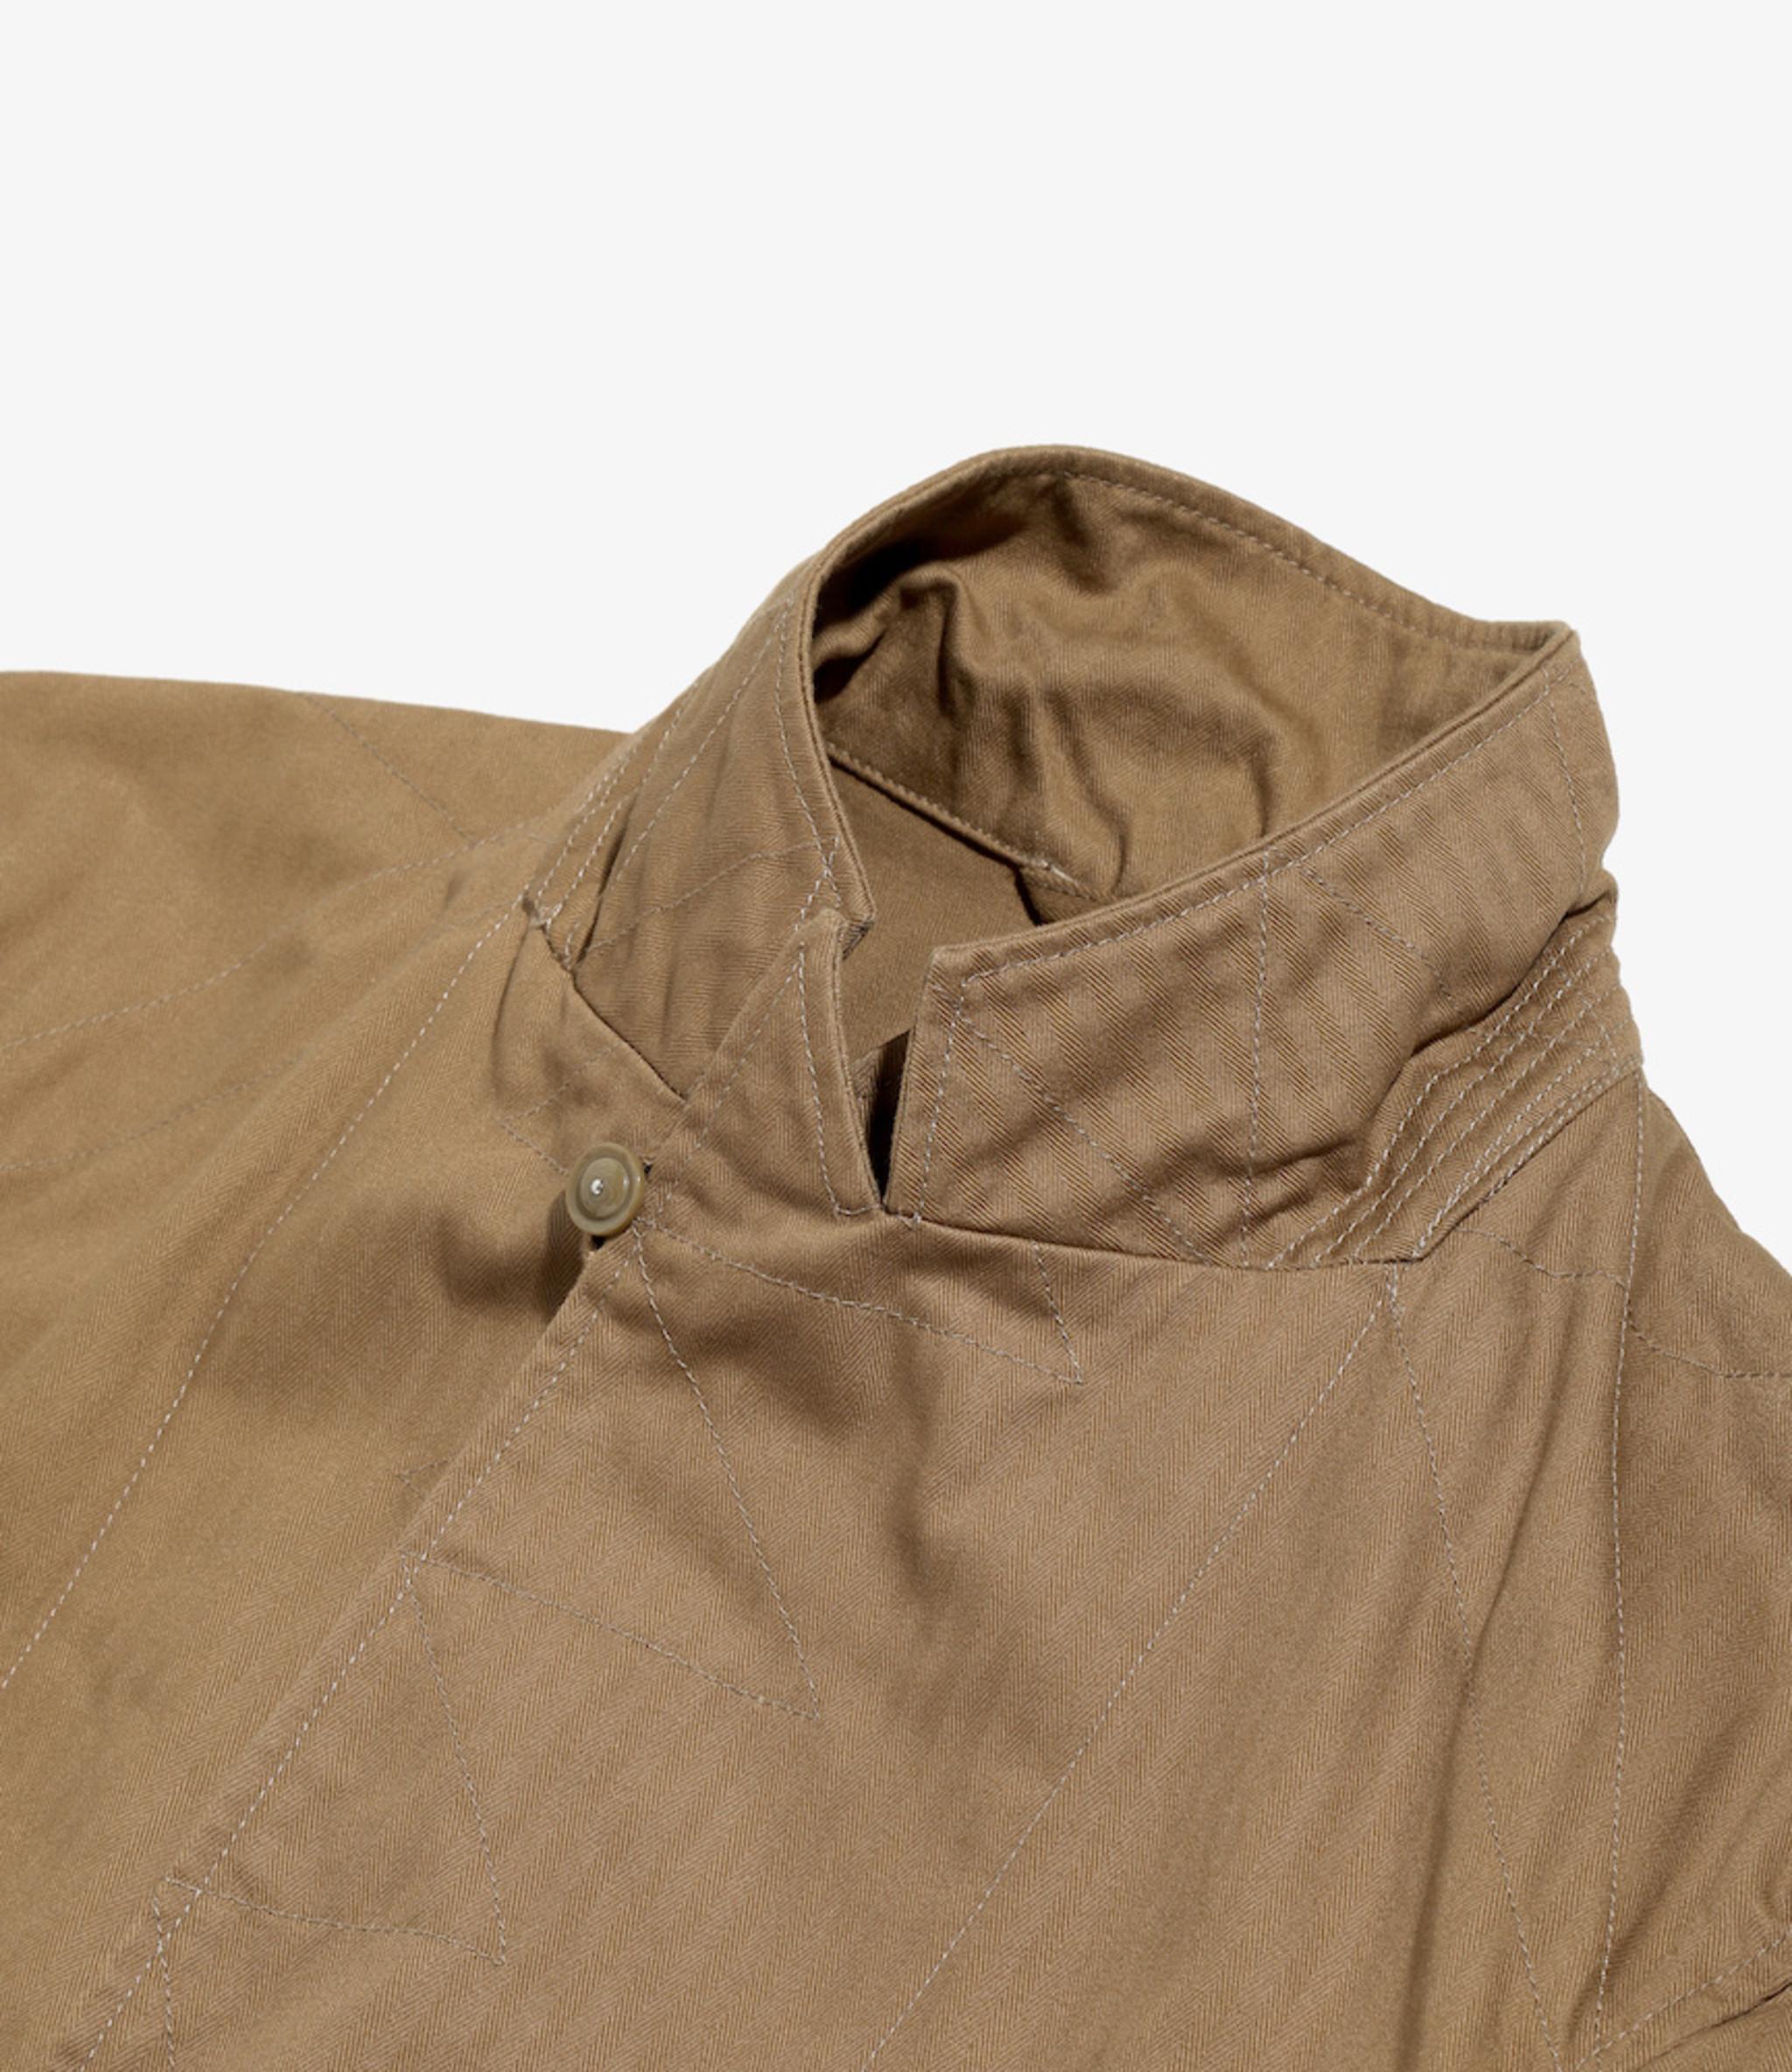 Engineered Garments Bedford Jacket - Brown Cotton Herringbone Twill